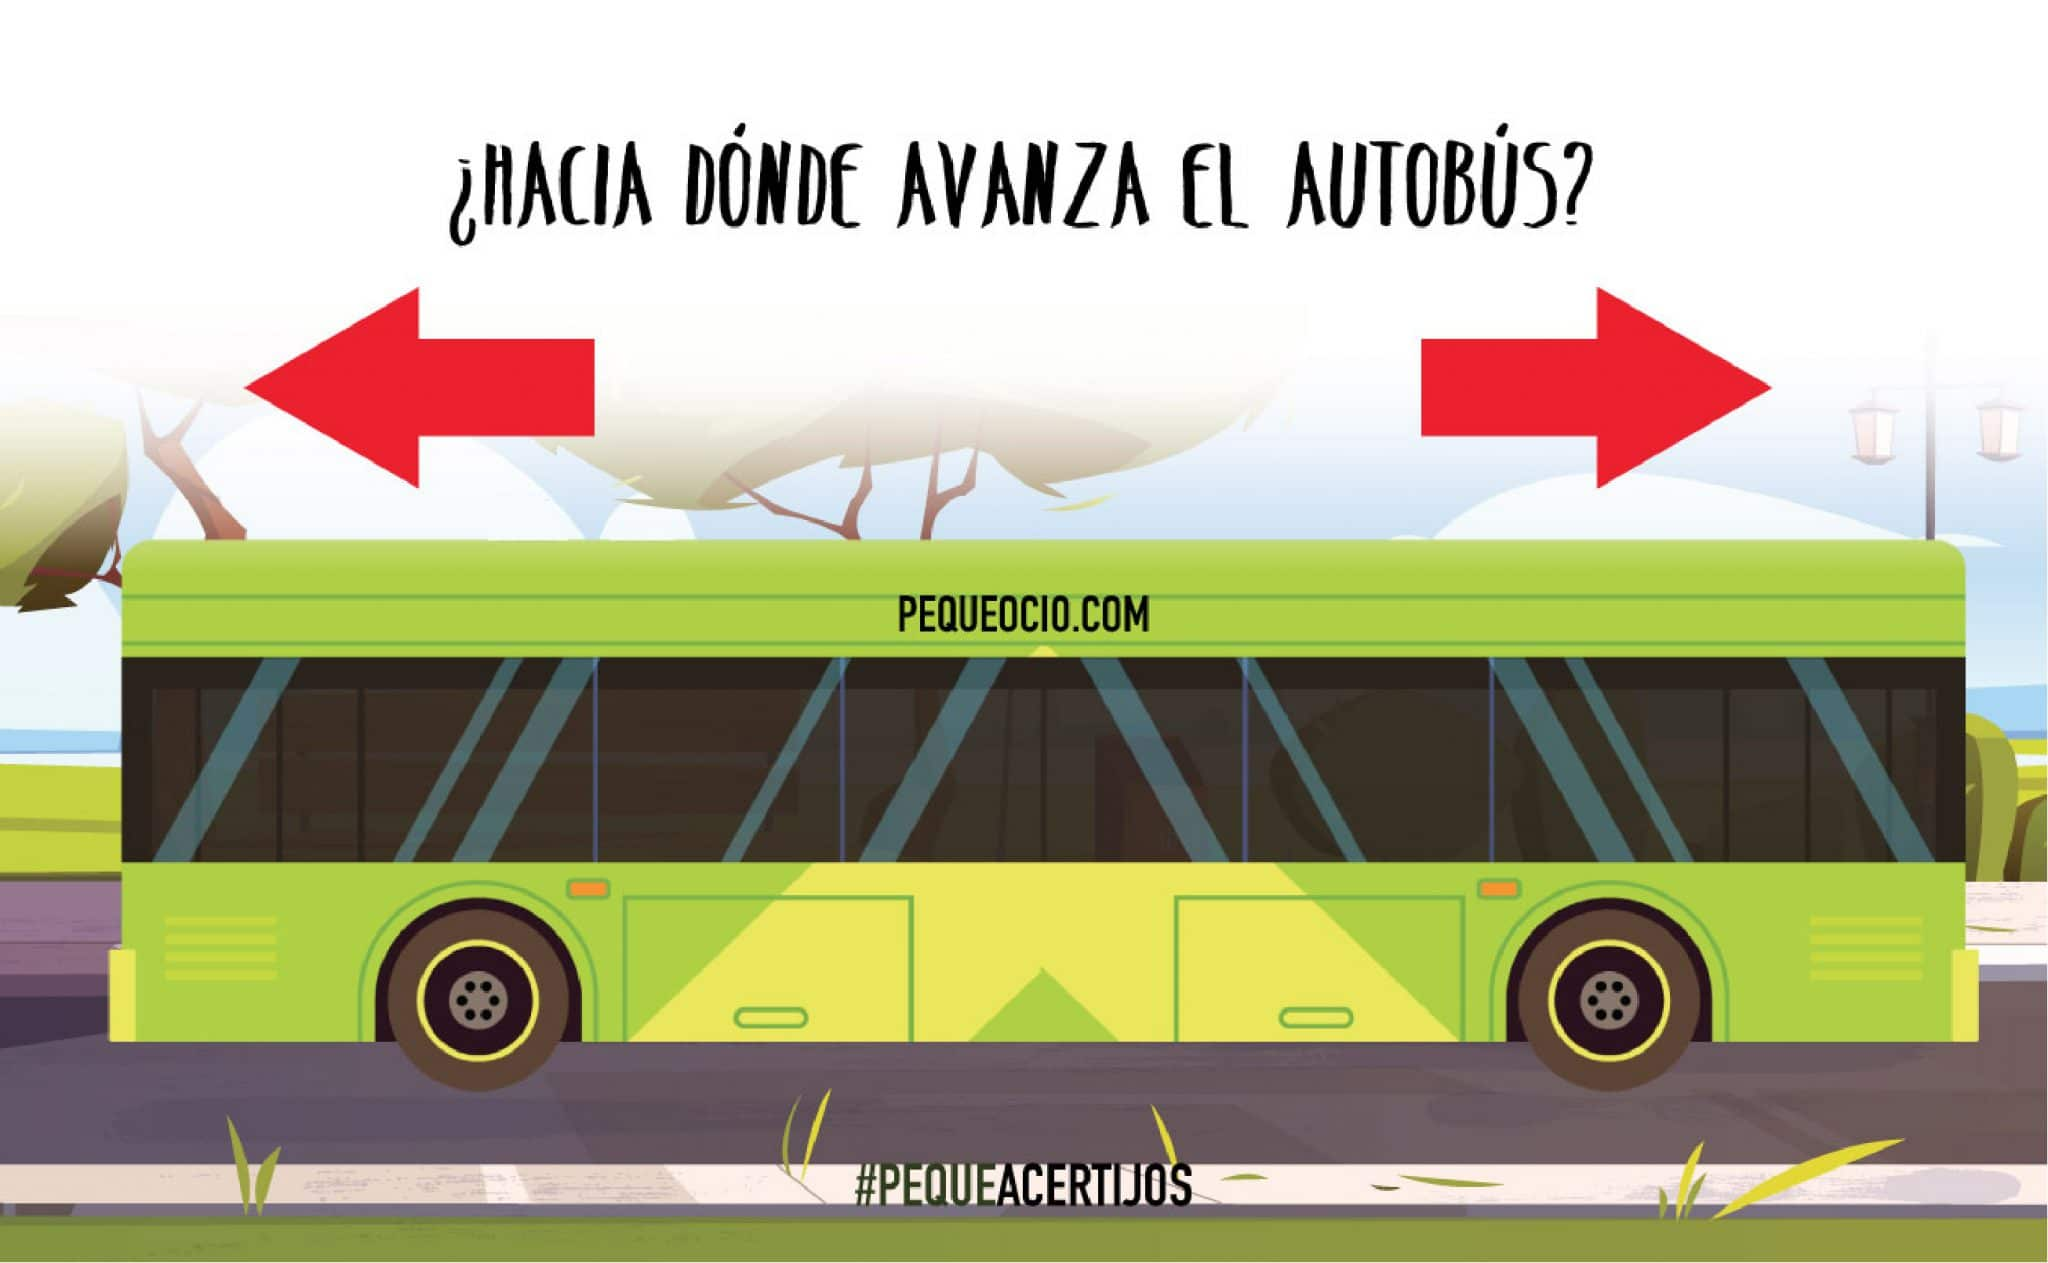 acertijo del autobus